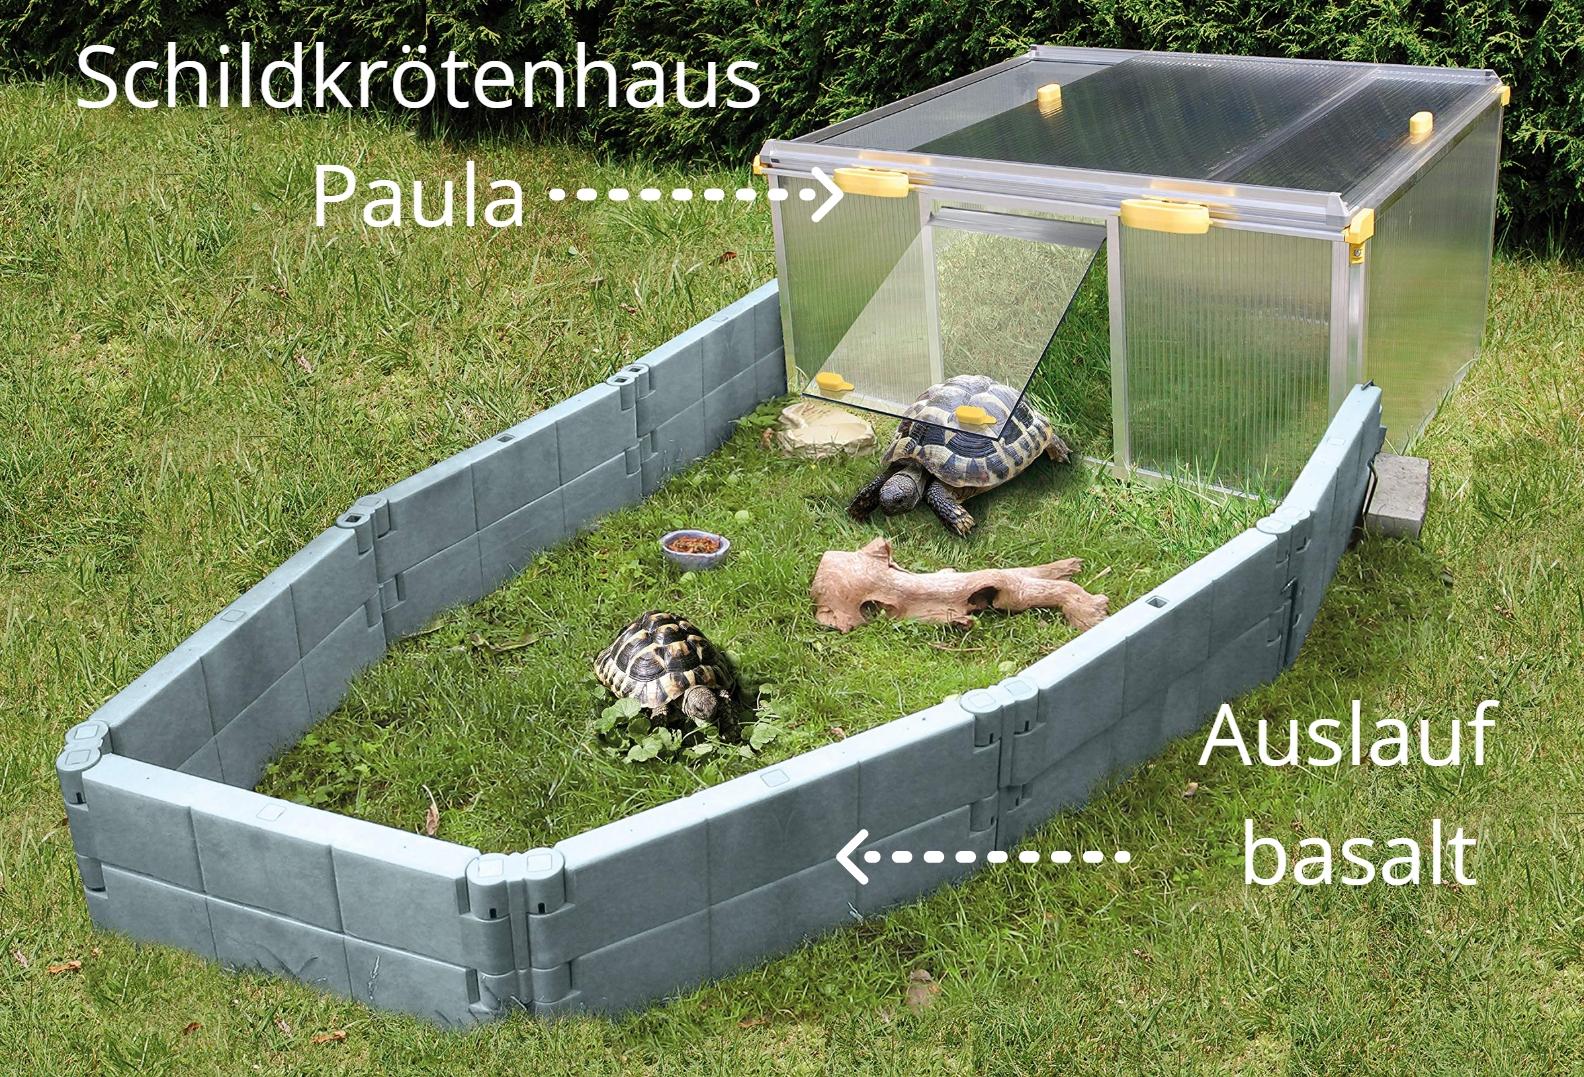 1_Schildkroetenhaus-Paula-Alltop-Fruehbeet-Anbausatz-Auslauf-basalt